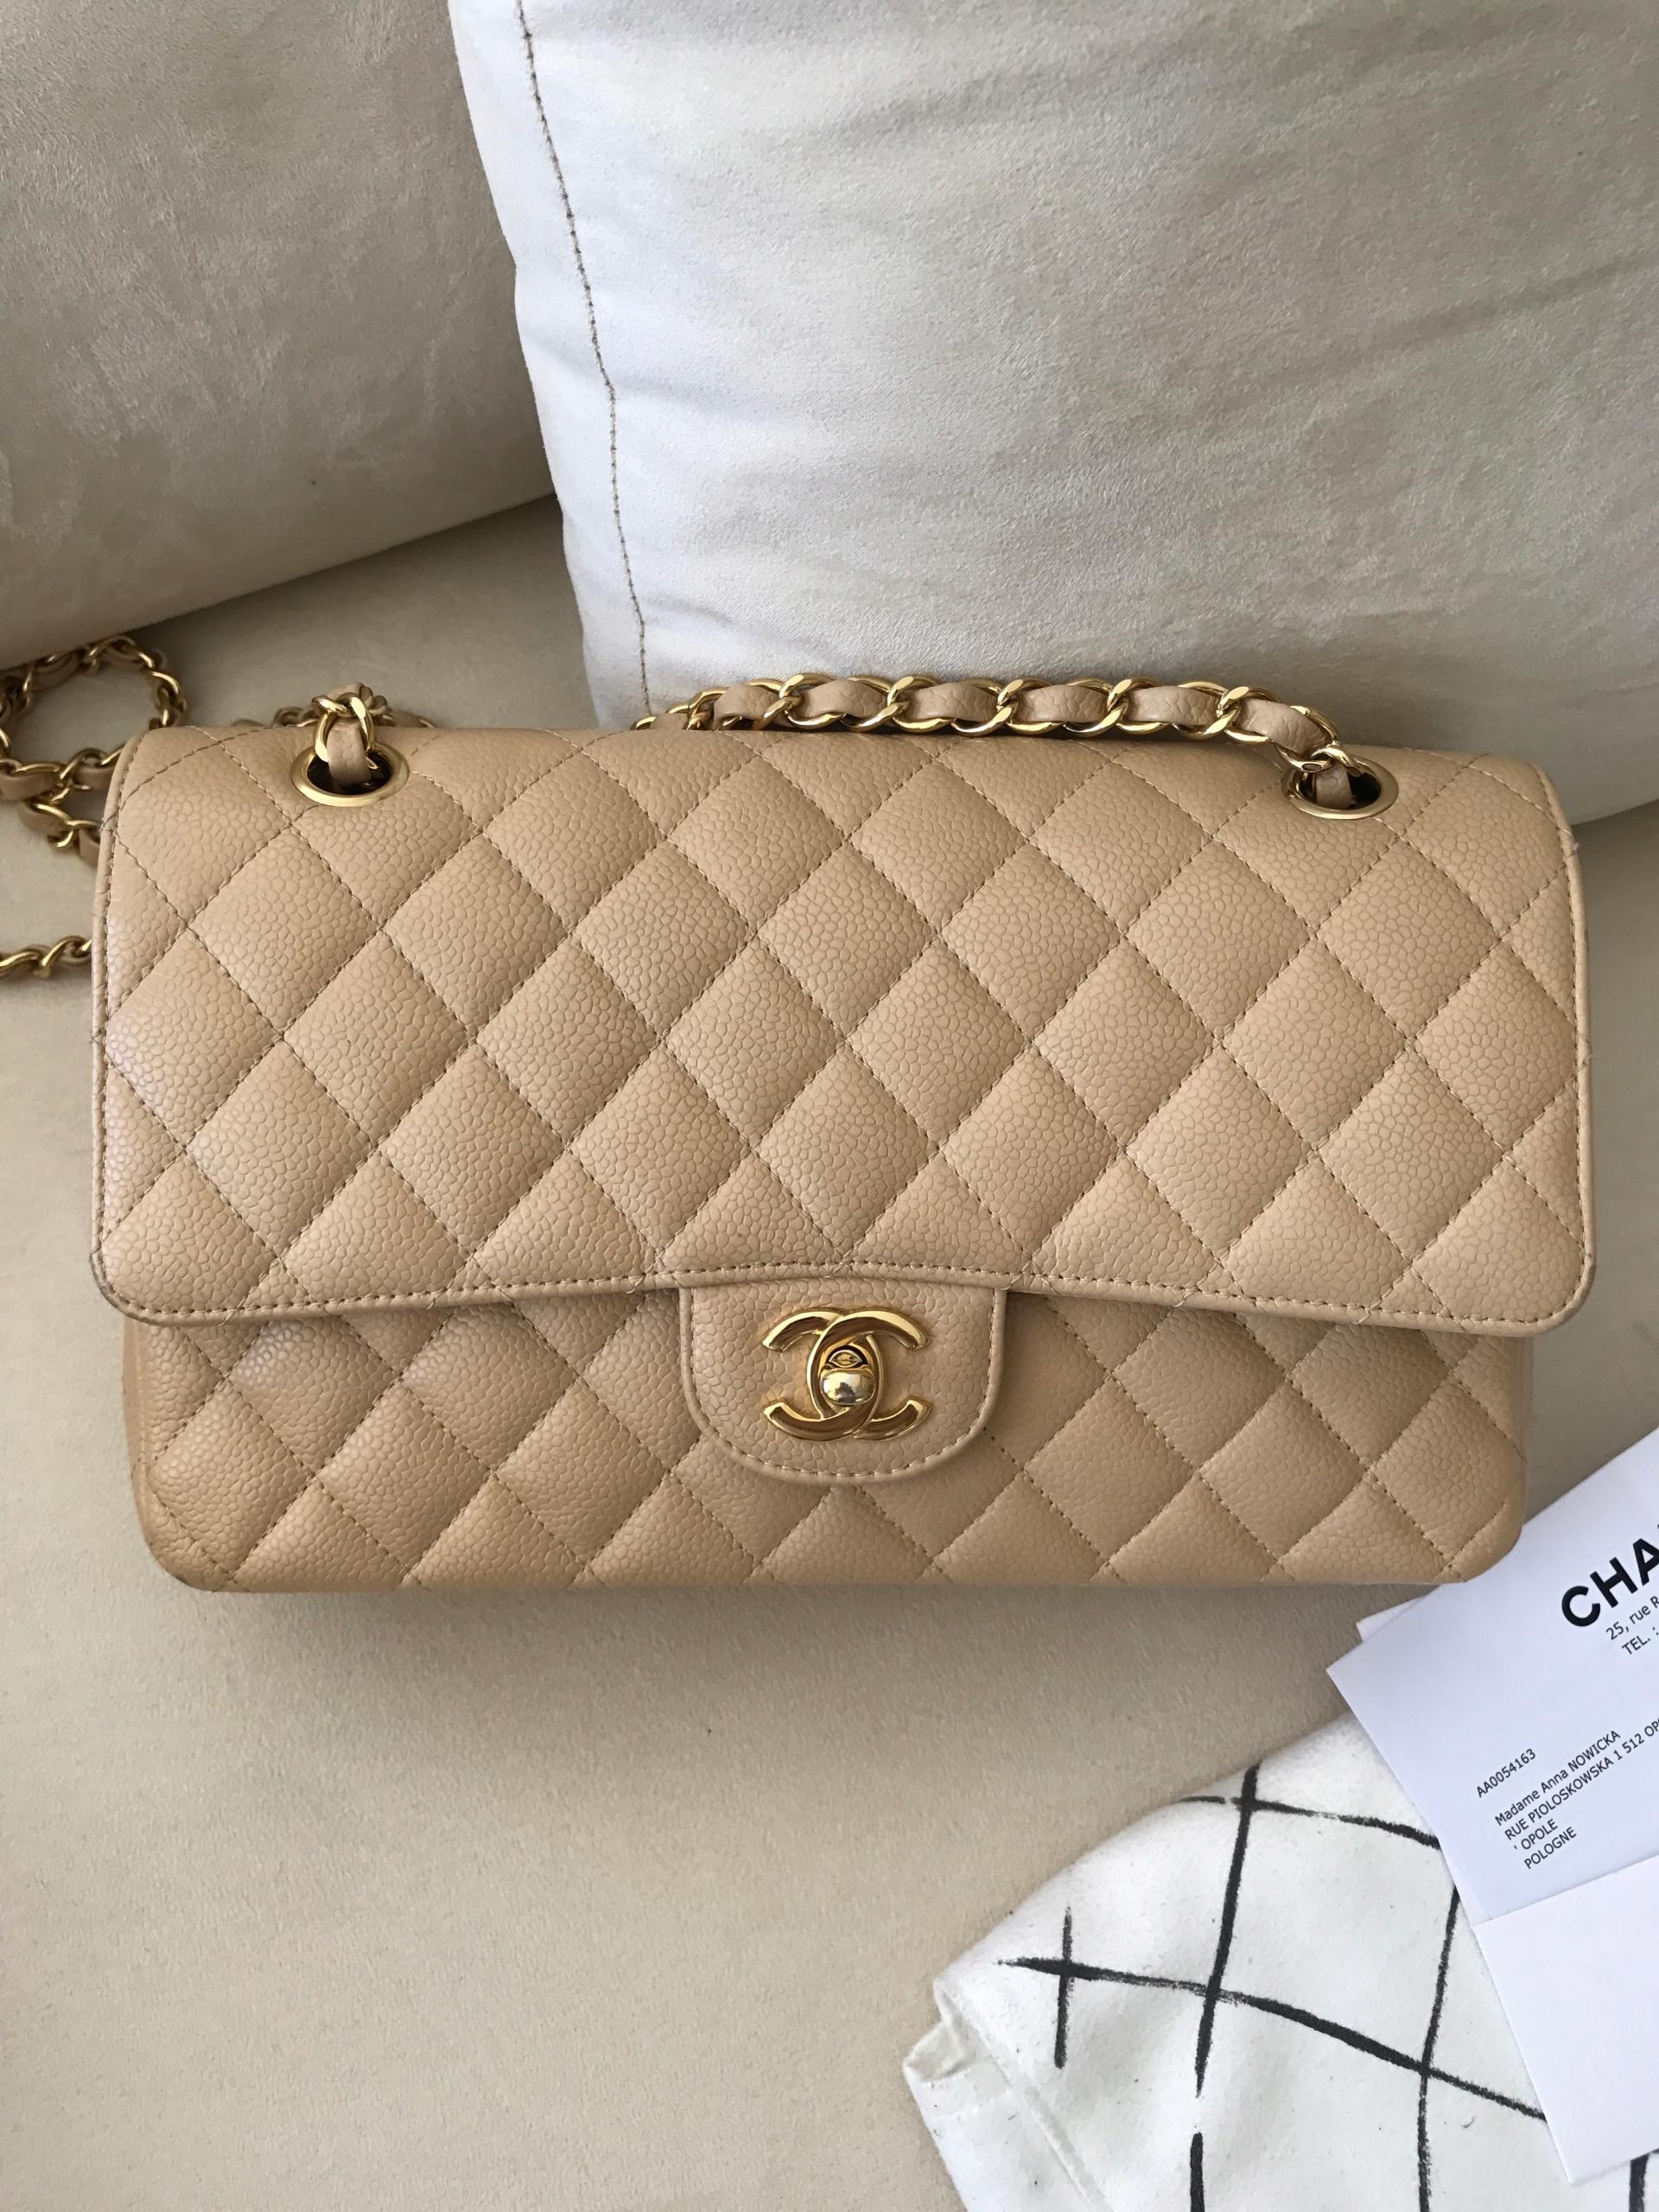 1bdce109ab6bd Chanel Flap Bag Medium z rachunkiem i pudełkiem - 7457366525 ...